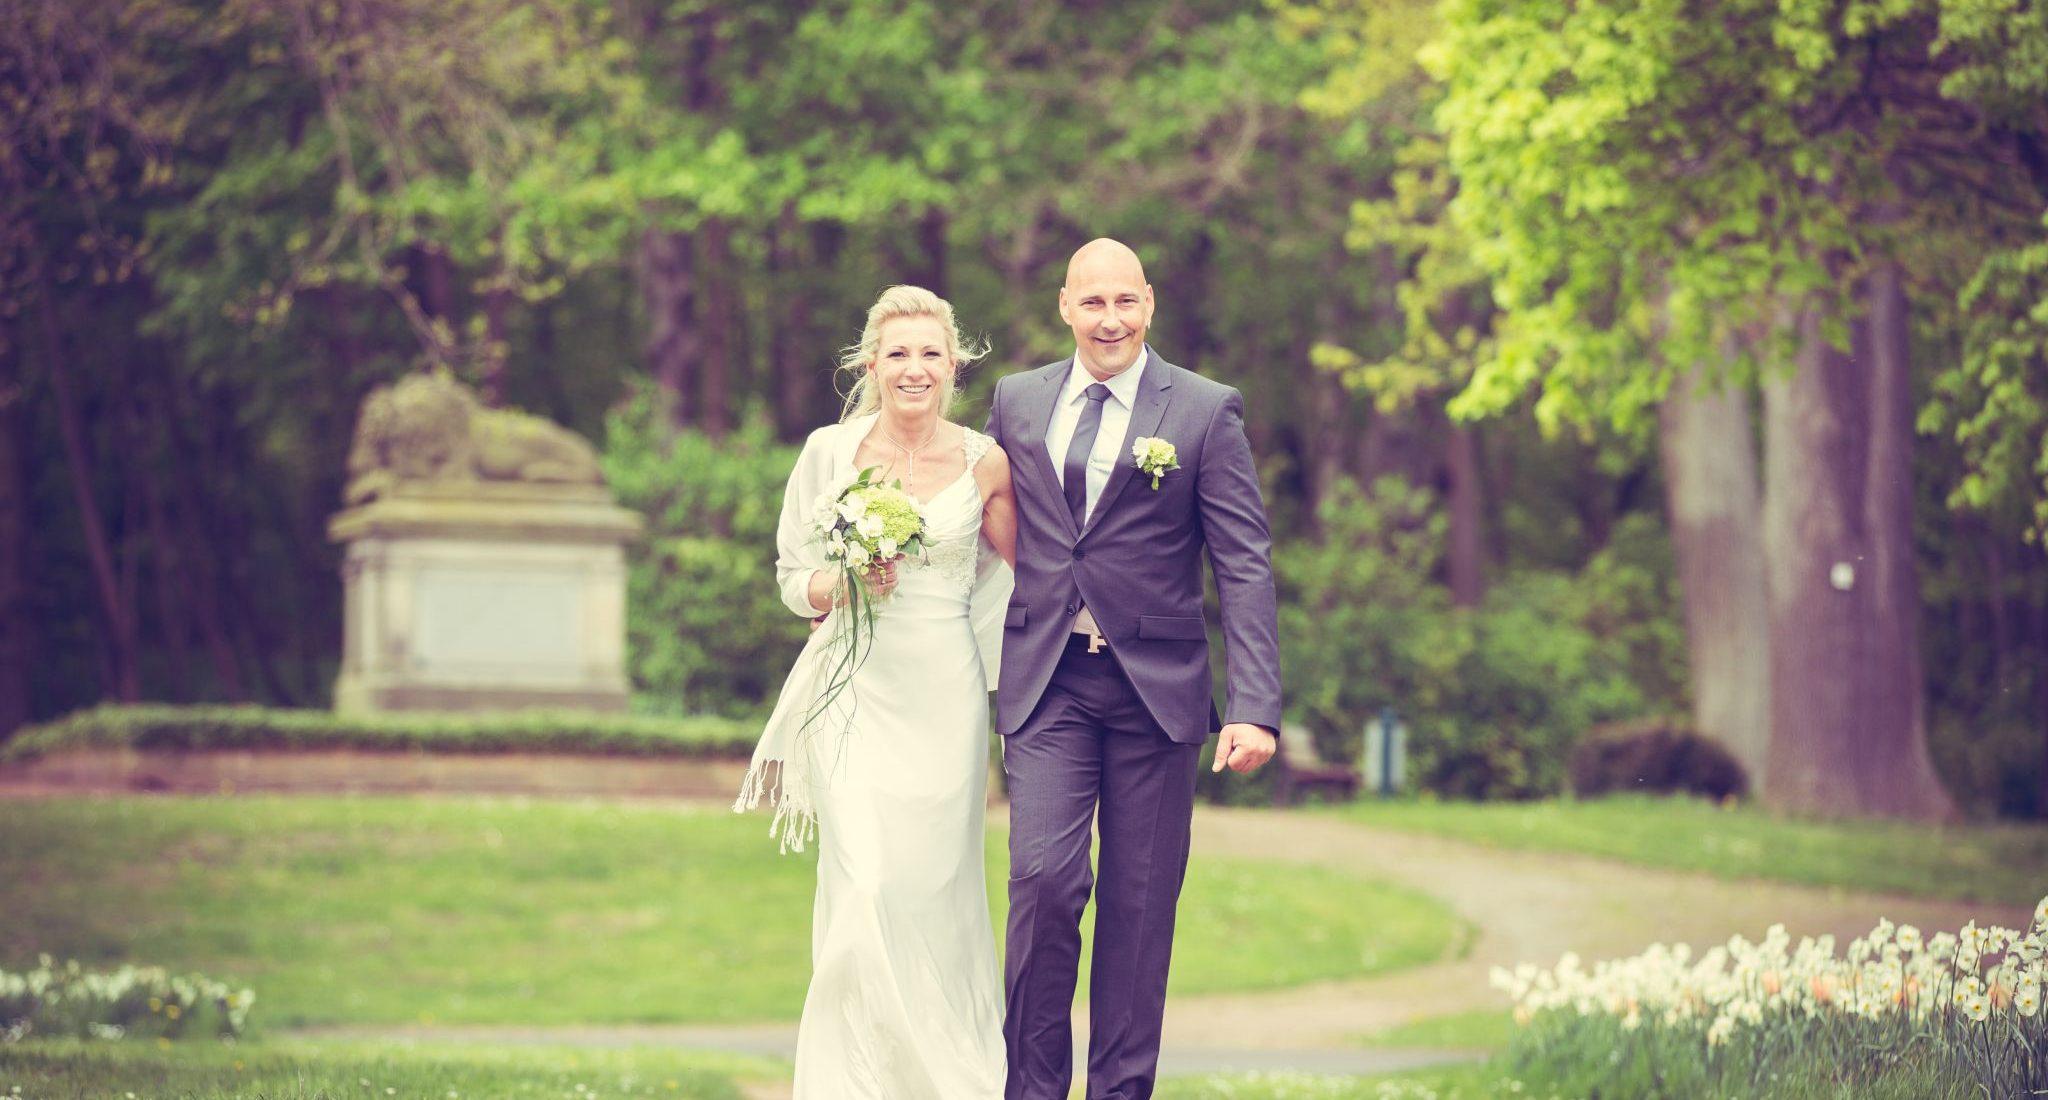 Hochzeit Ines & Andreas 212 1-1250 Sek. bei f - 3,2 © Sebastian Petersen